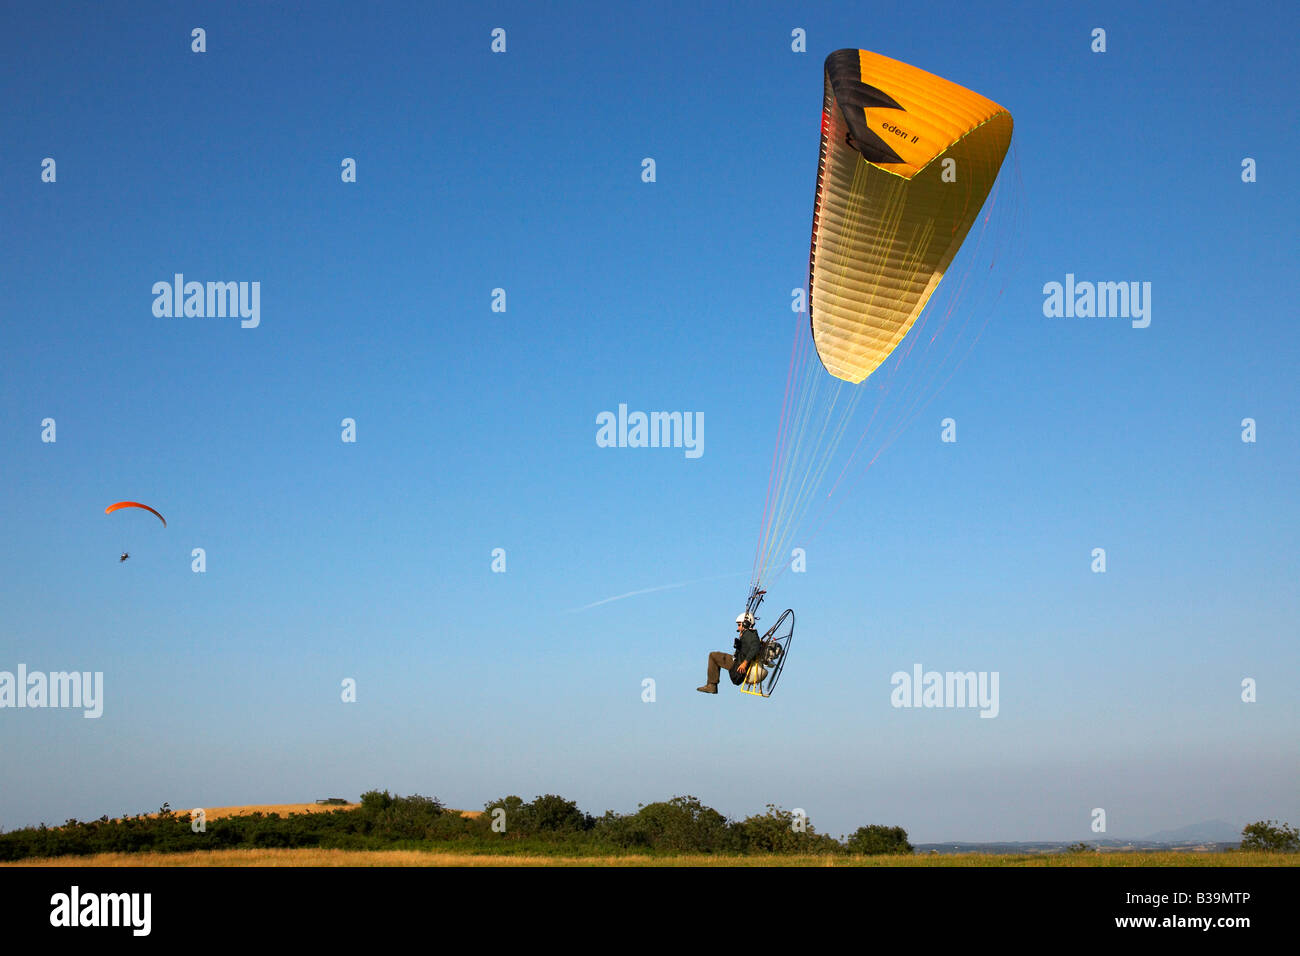 Motorized paraglider Pays Basque France - Stock Image